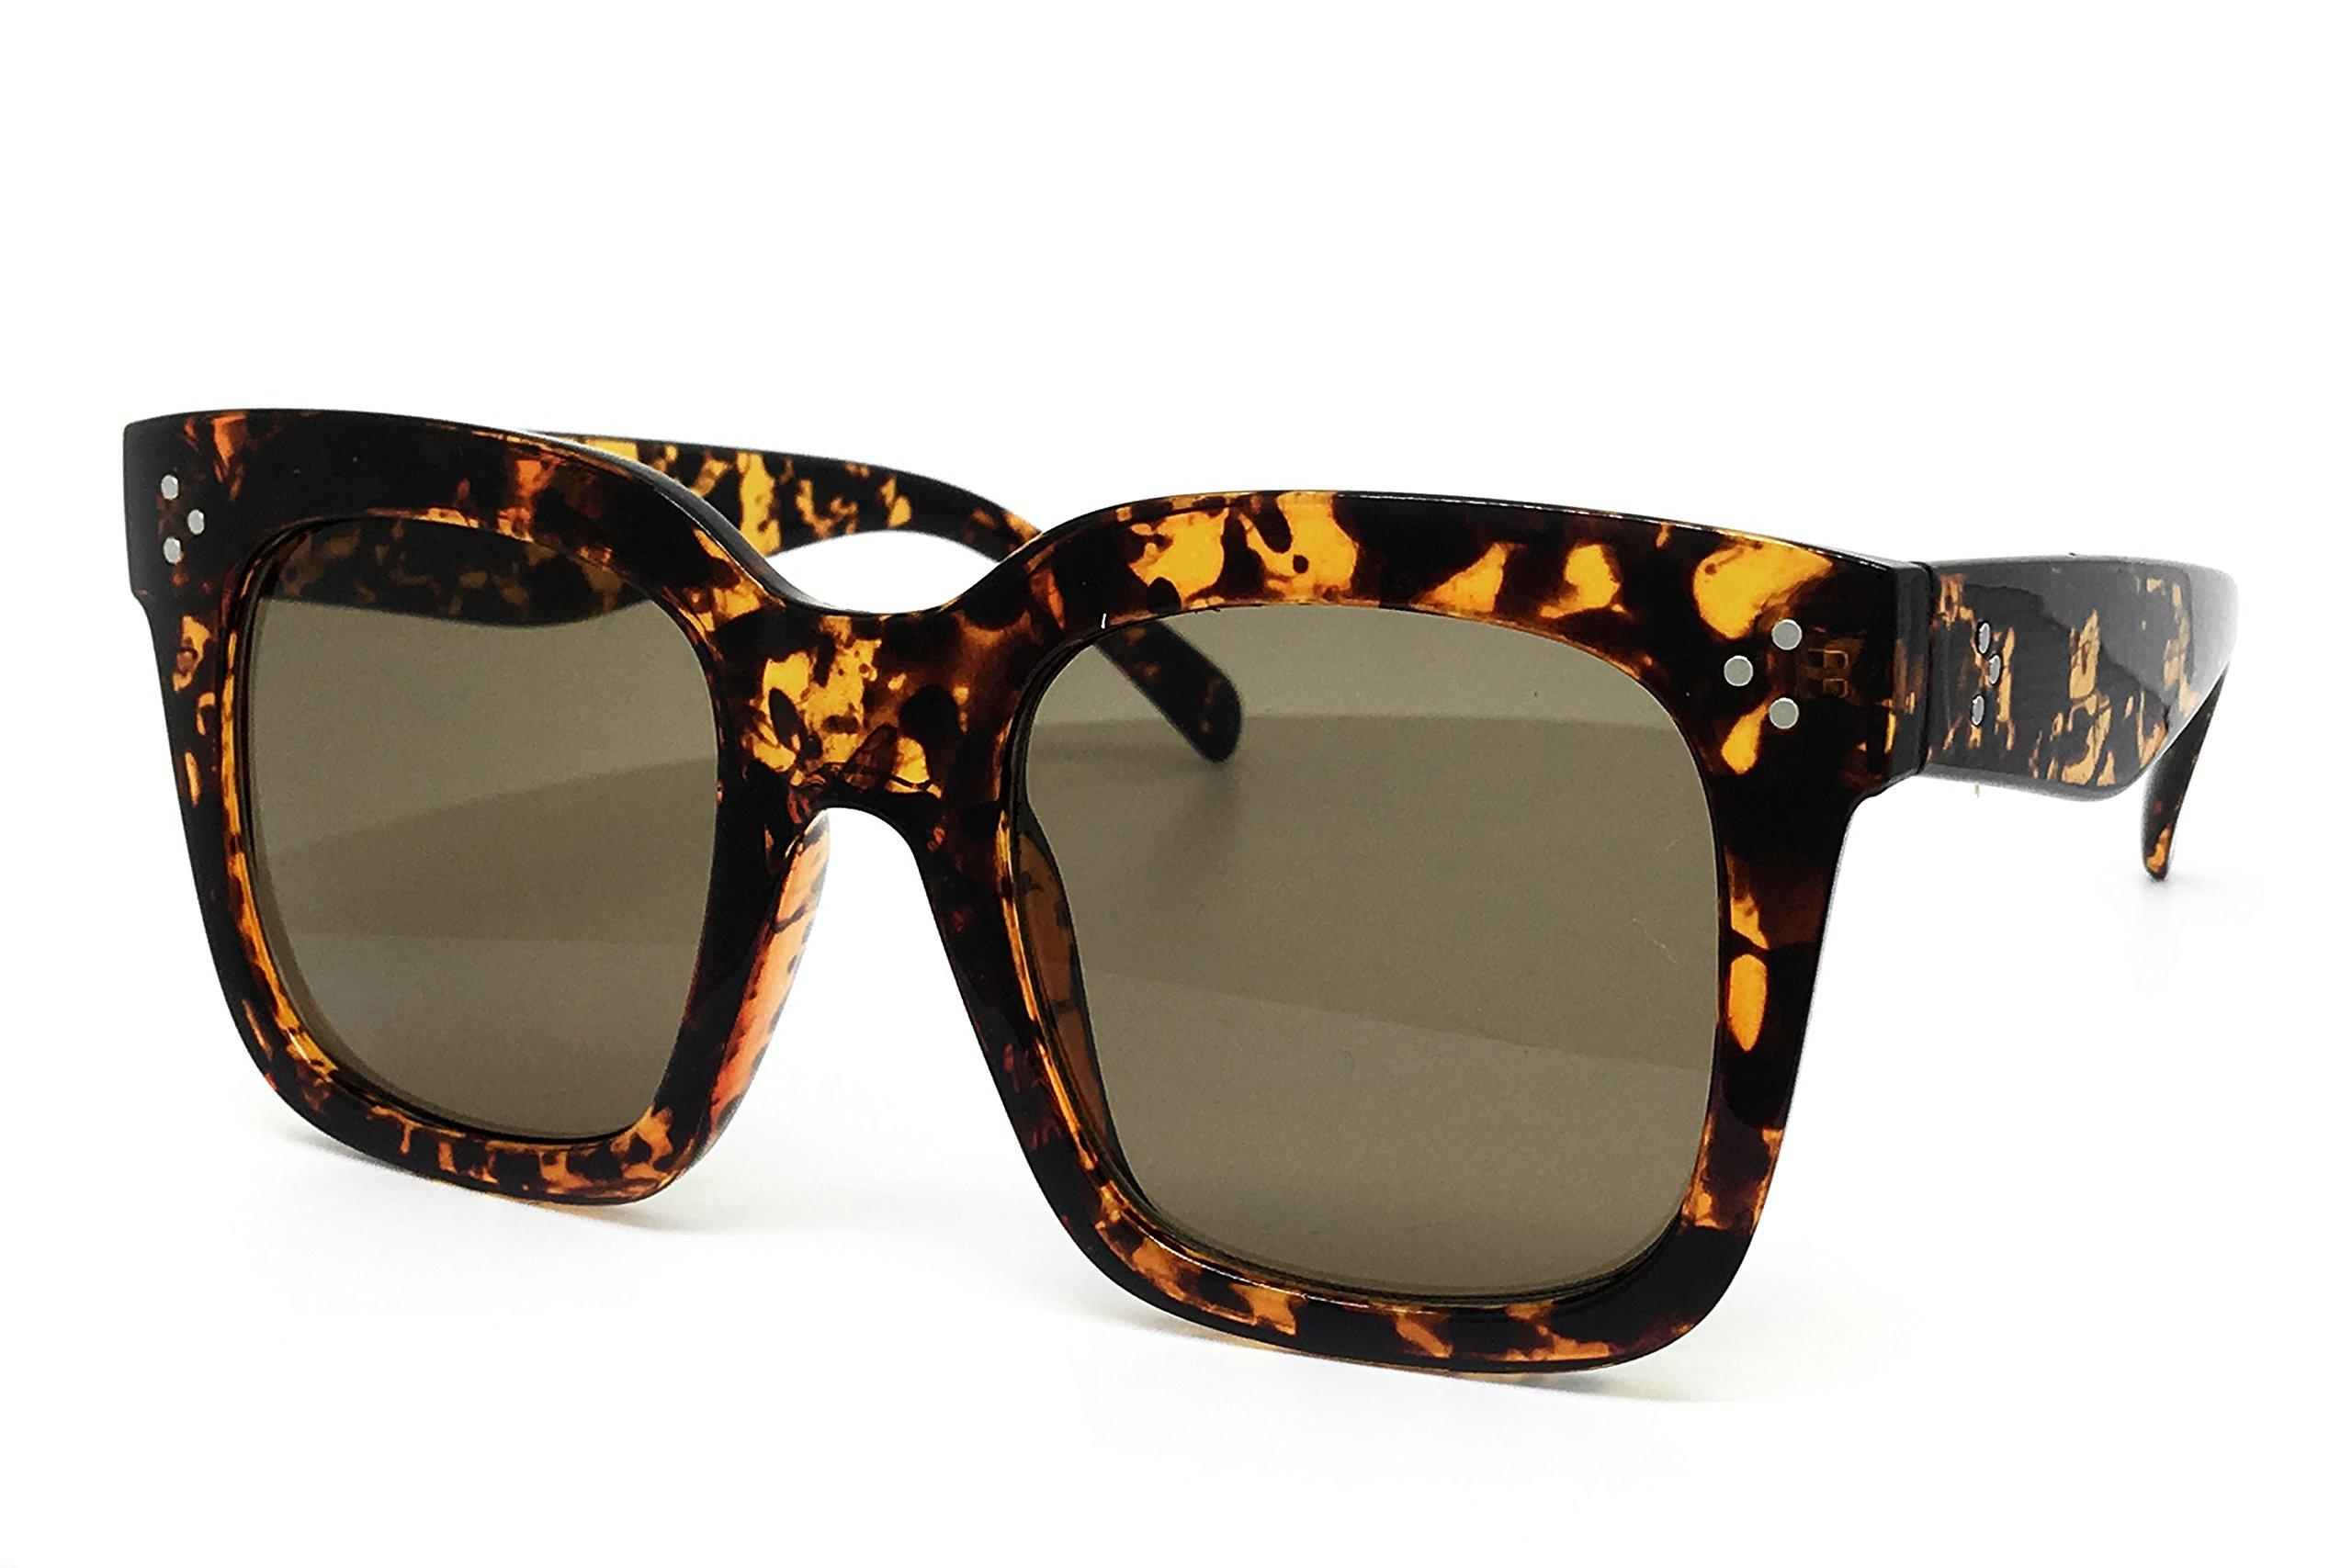 O2 Eyewear 7222 Premium Oversize XXL Women Men Mirror Fashion Sunglasses (Oversized, BROWN)